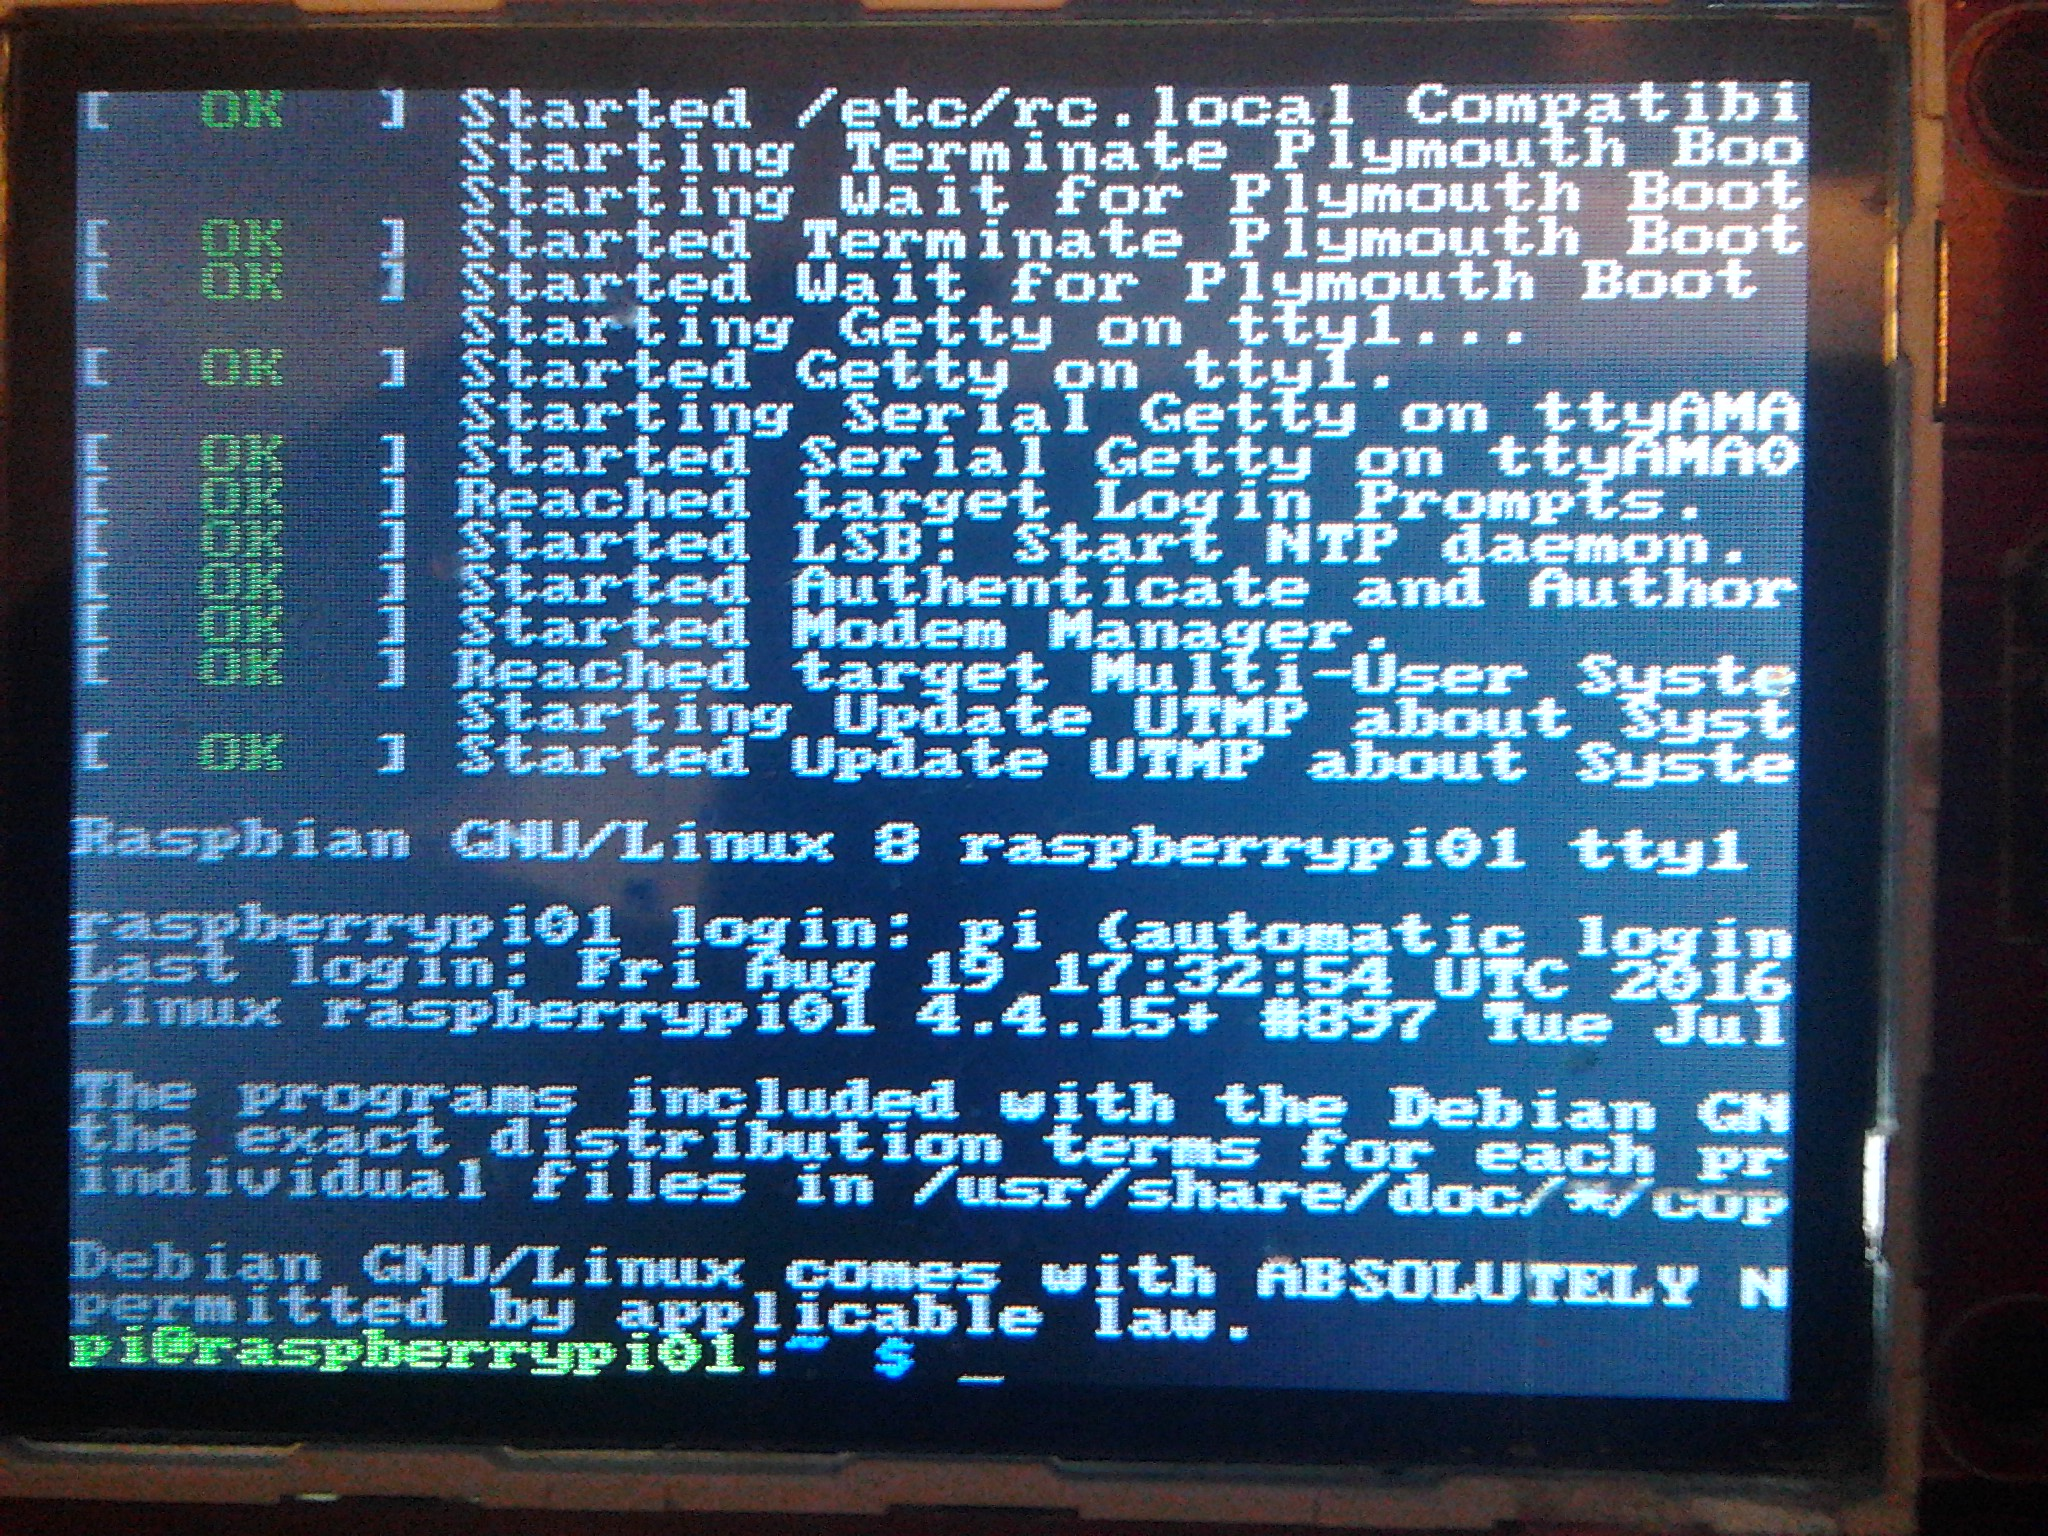 5$ 480x320 TFT for Raspberry Pi Zero? - Raspberry Pi Forums